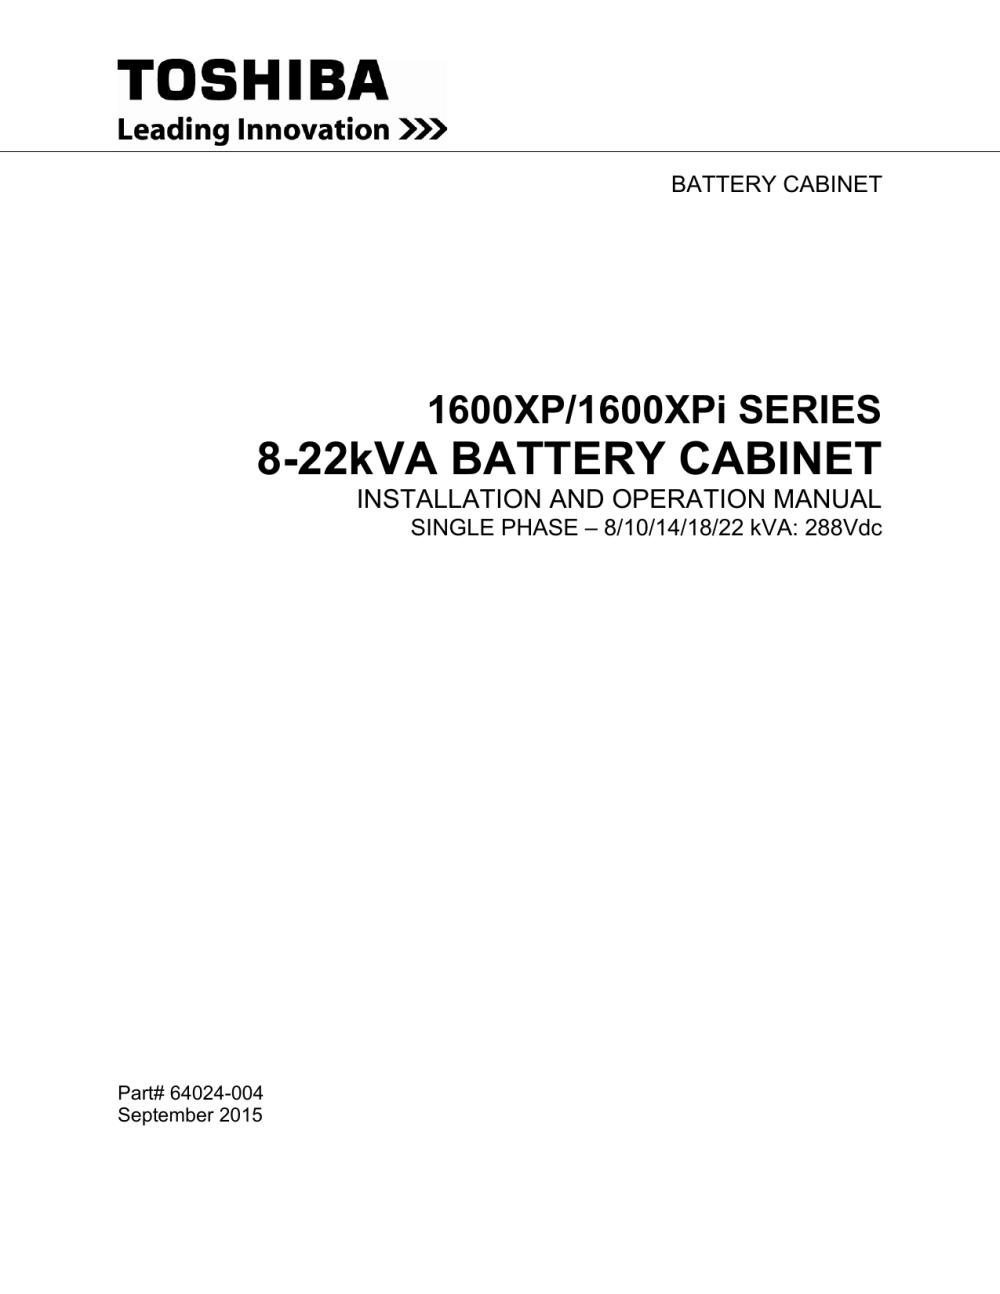 medium resolution of 1600xp xpi series ups battery cabinet manual 8 22kva